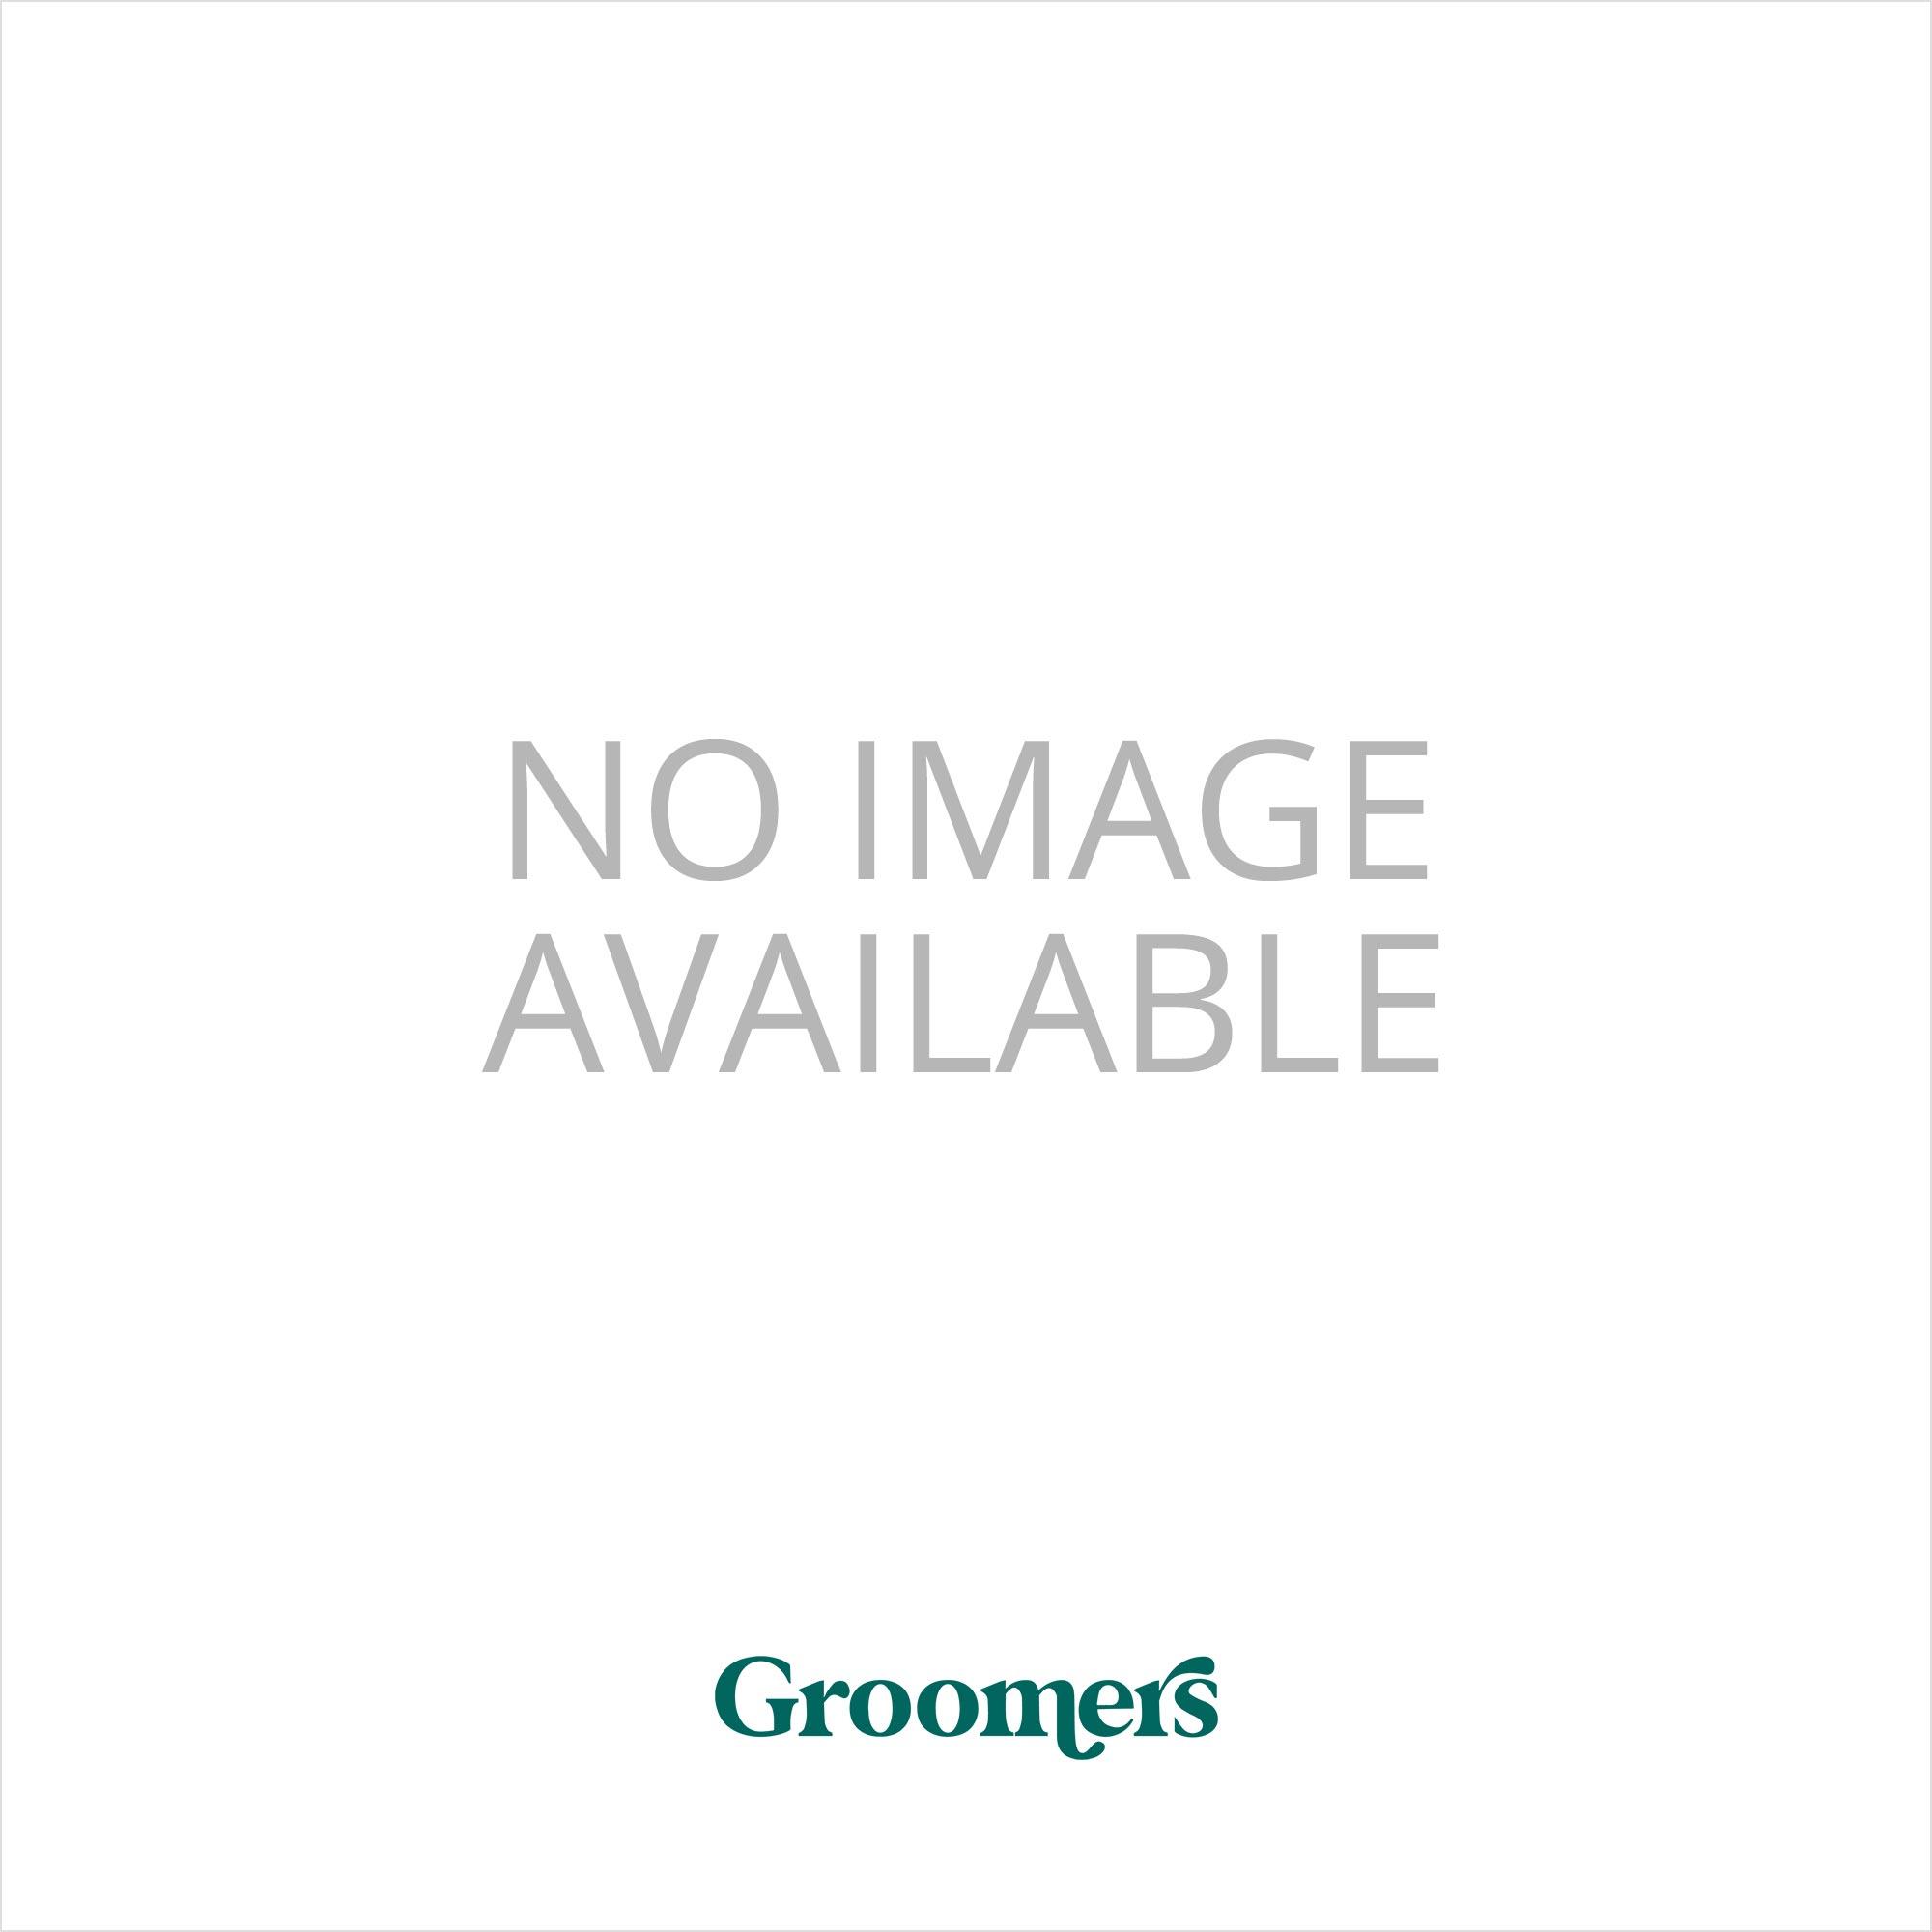 Groomers Online Logo